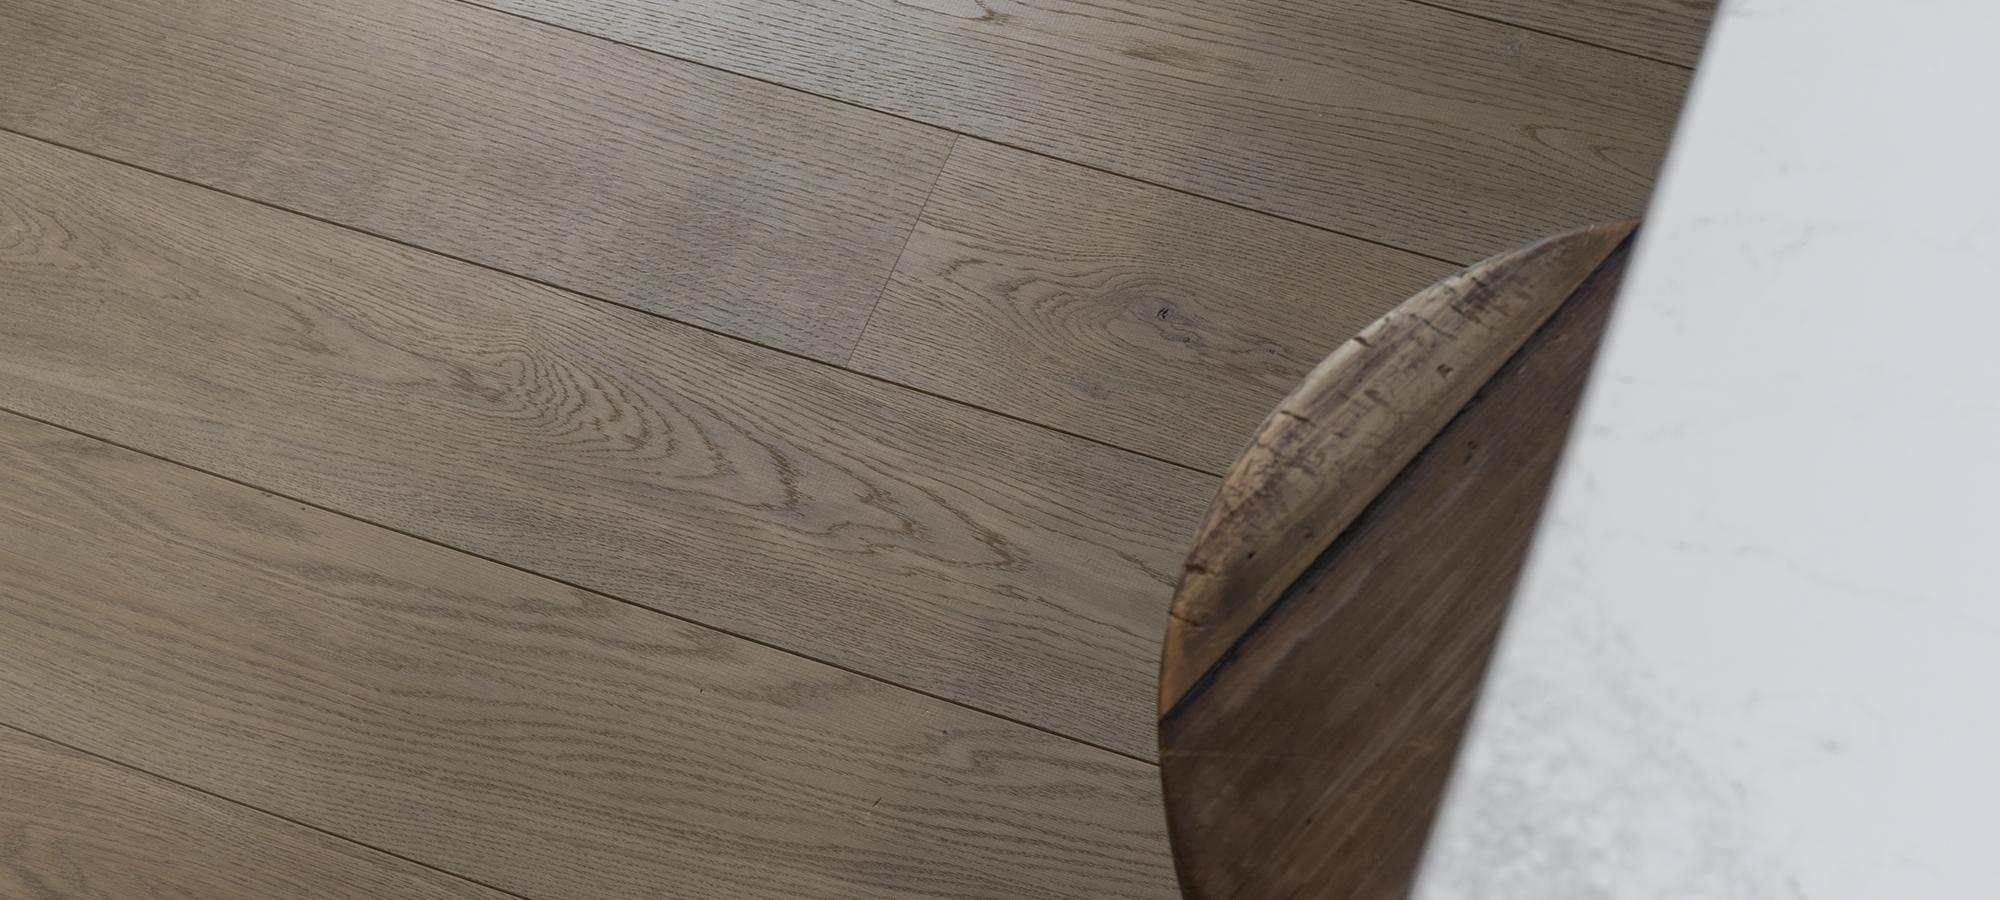 Planed Surface European Oak Wide Plank Flooring Texture